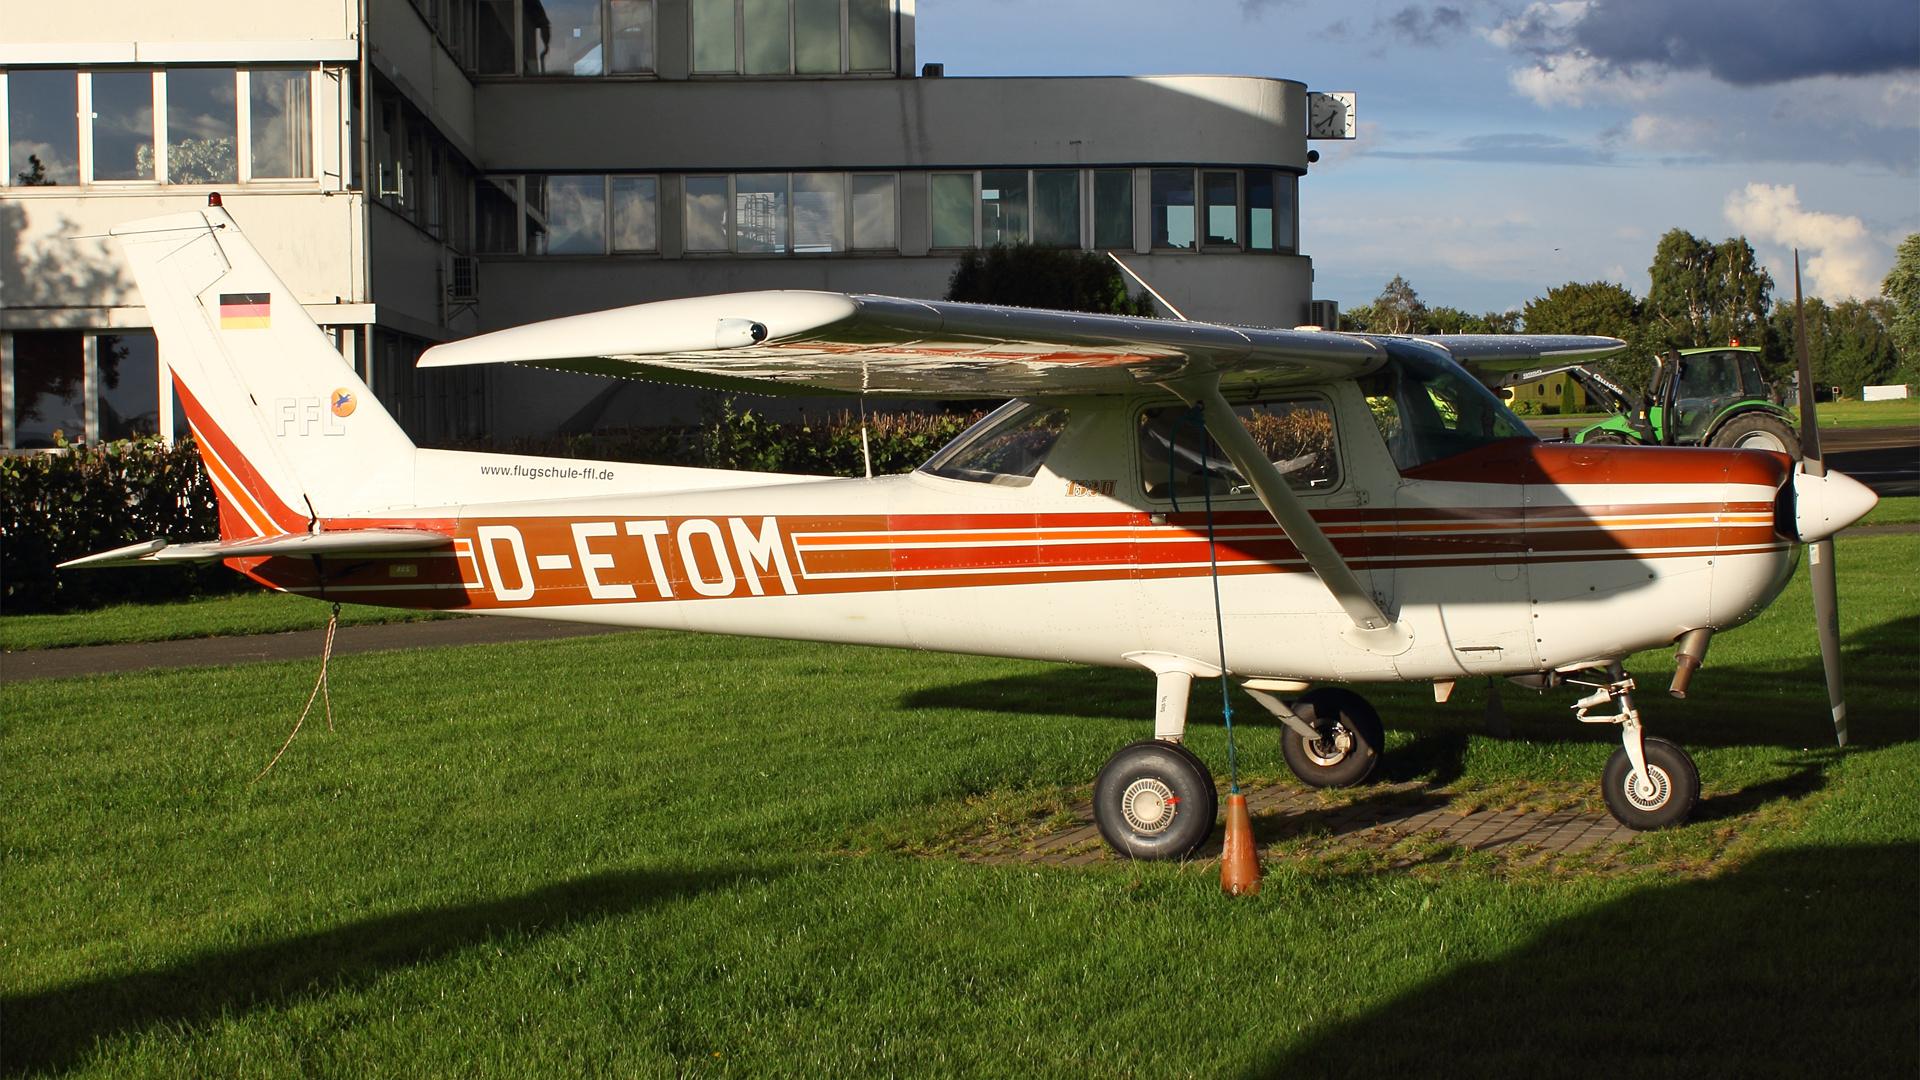 D-ETOM-1 C152 ESS 201509